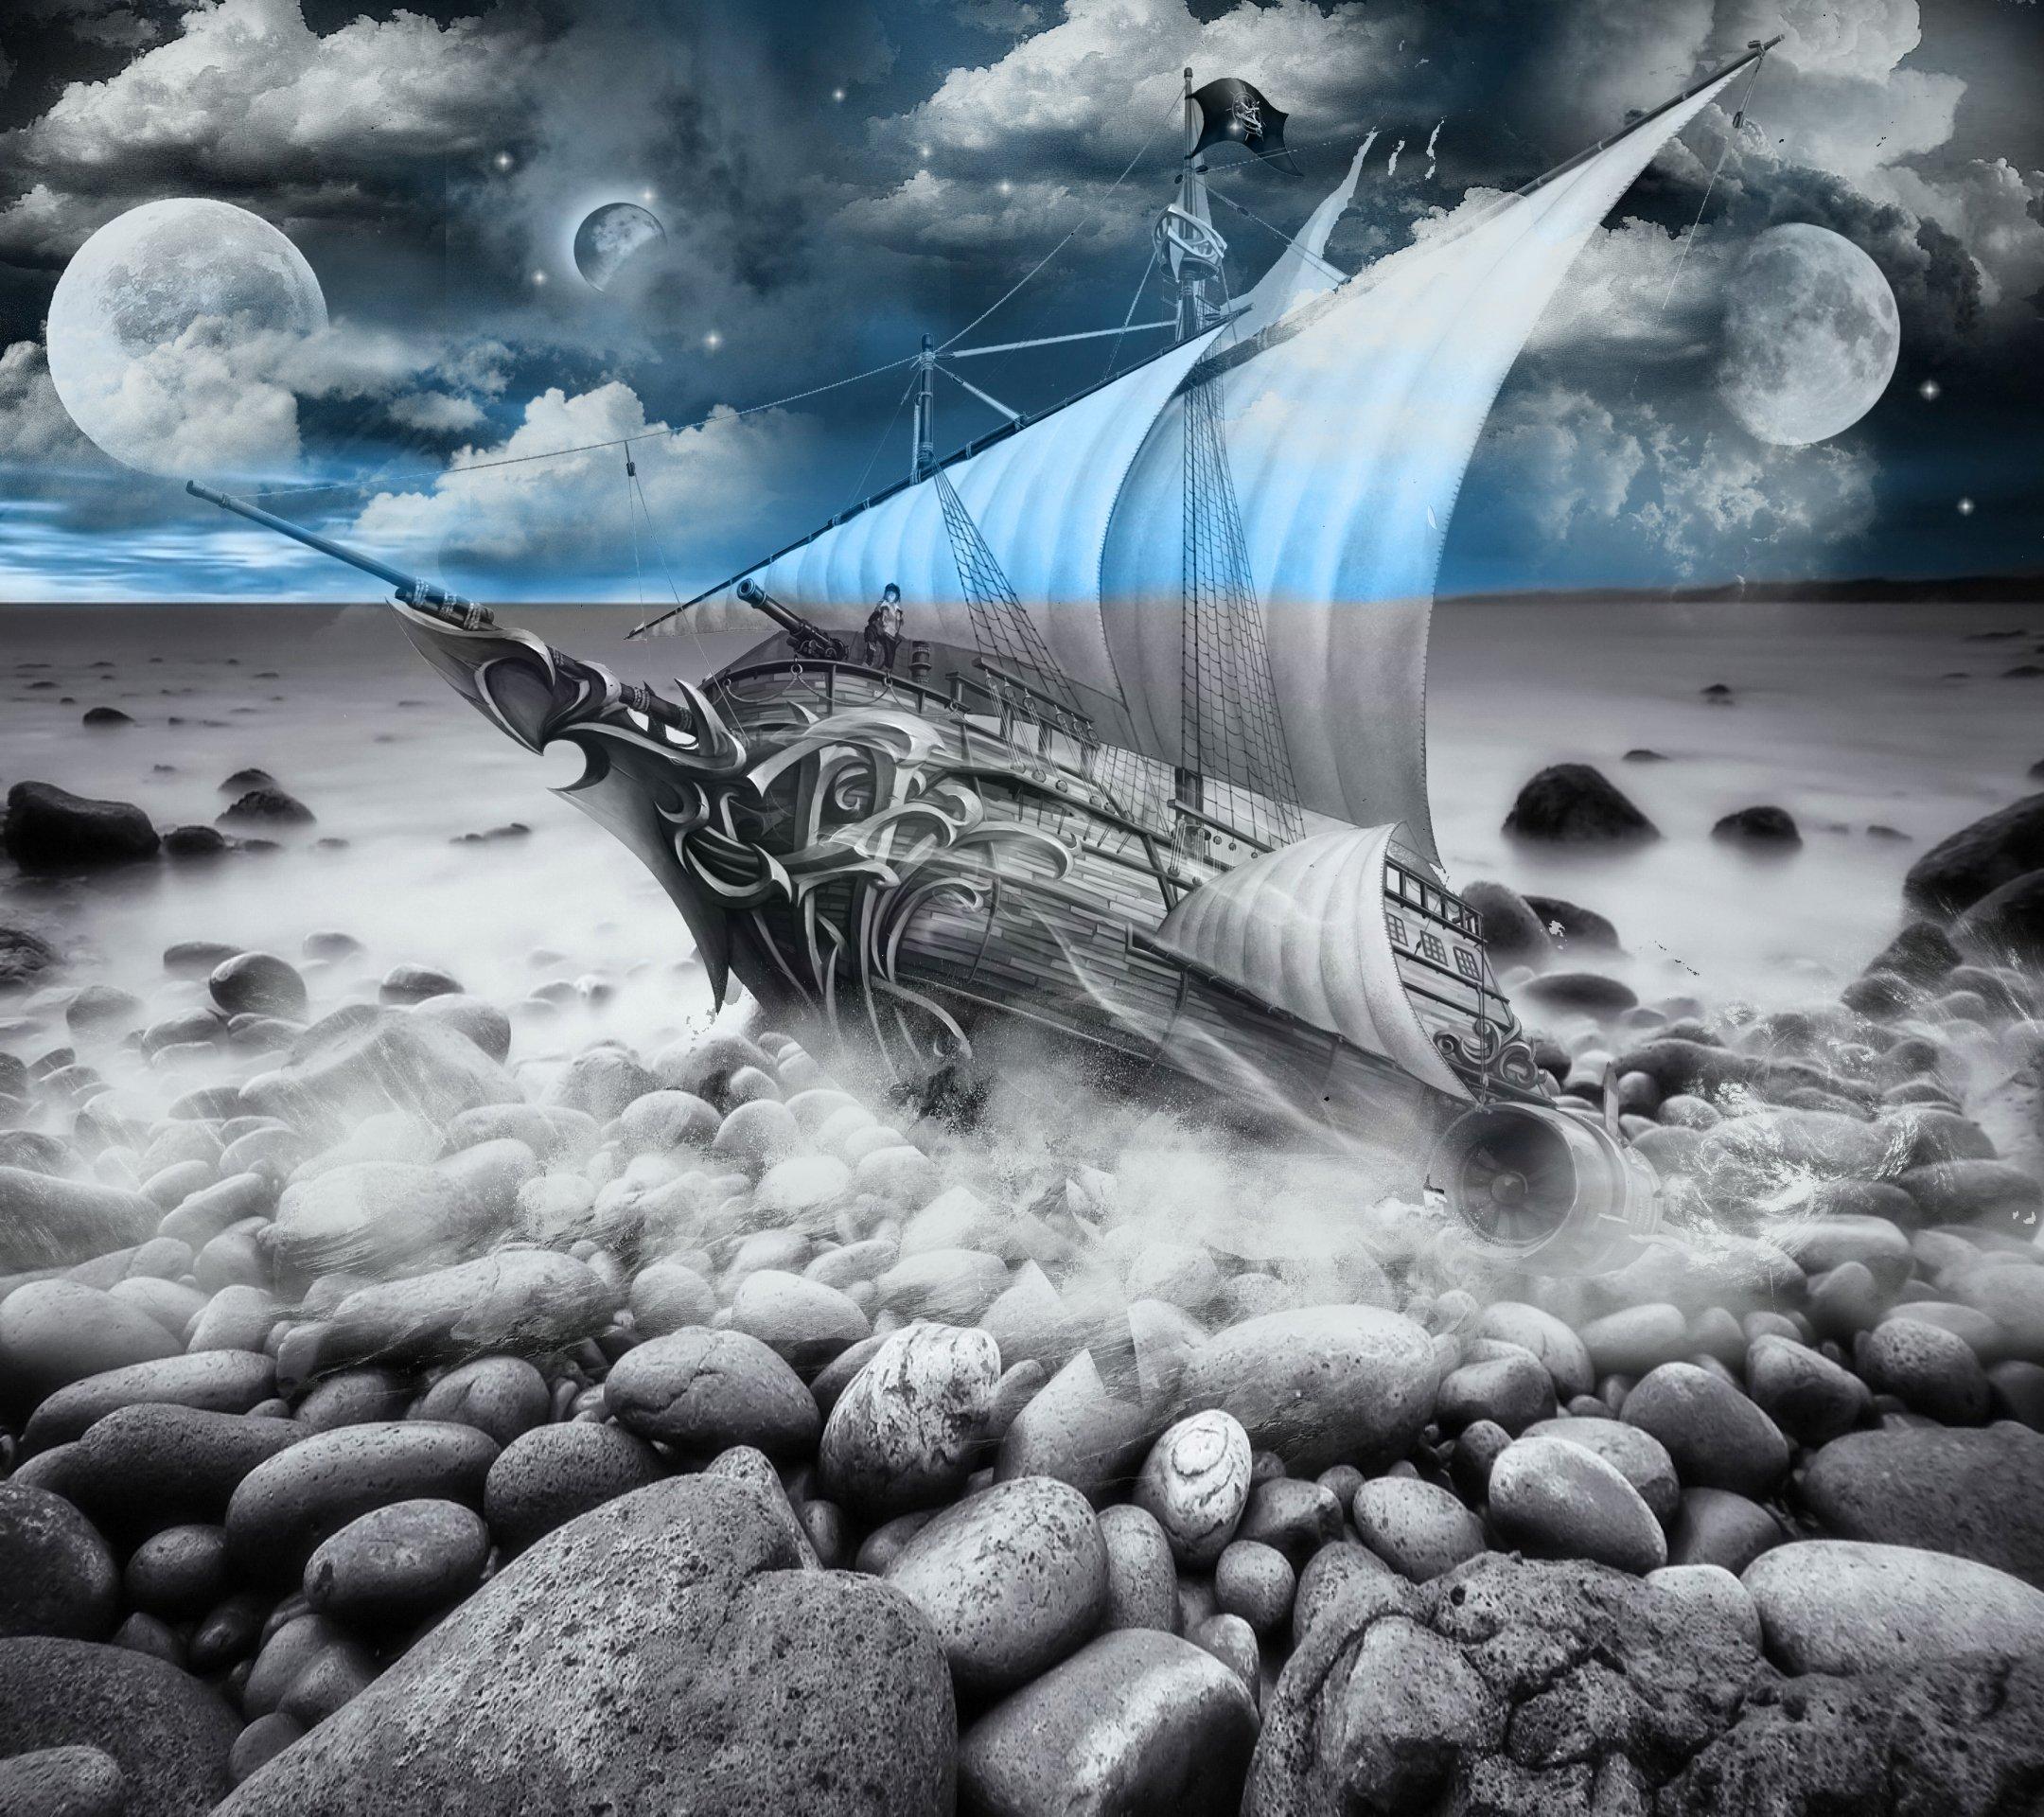 Fantasy Landscape Wallpaper: Landscape Ship Wallpaper